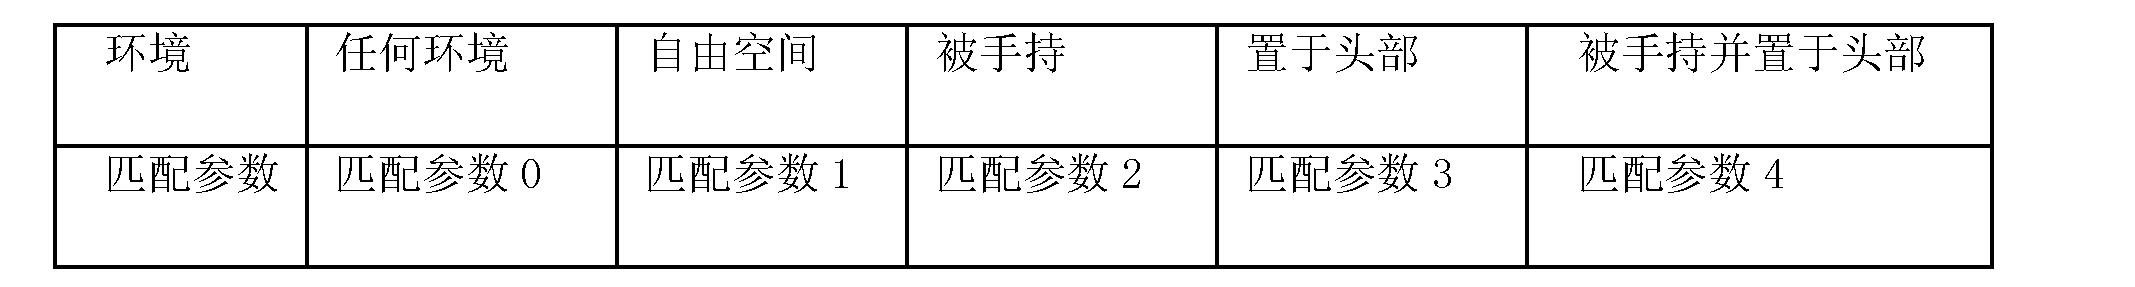 Figure CN102404015AD00101